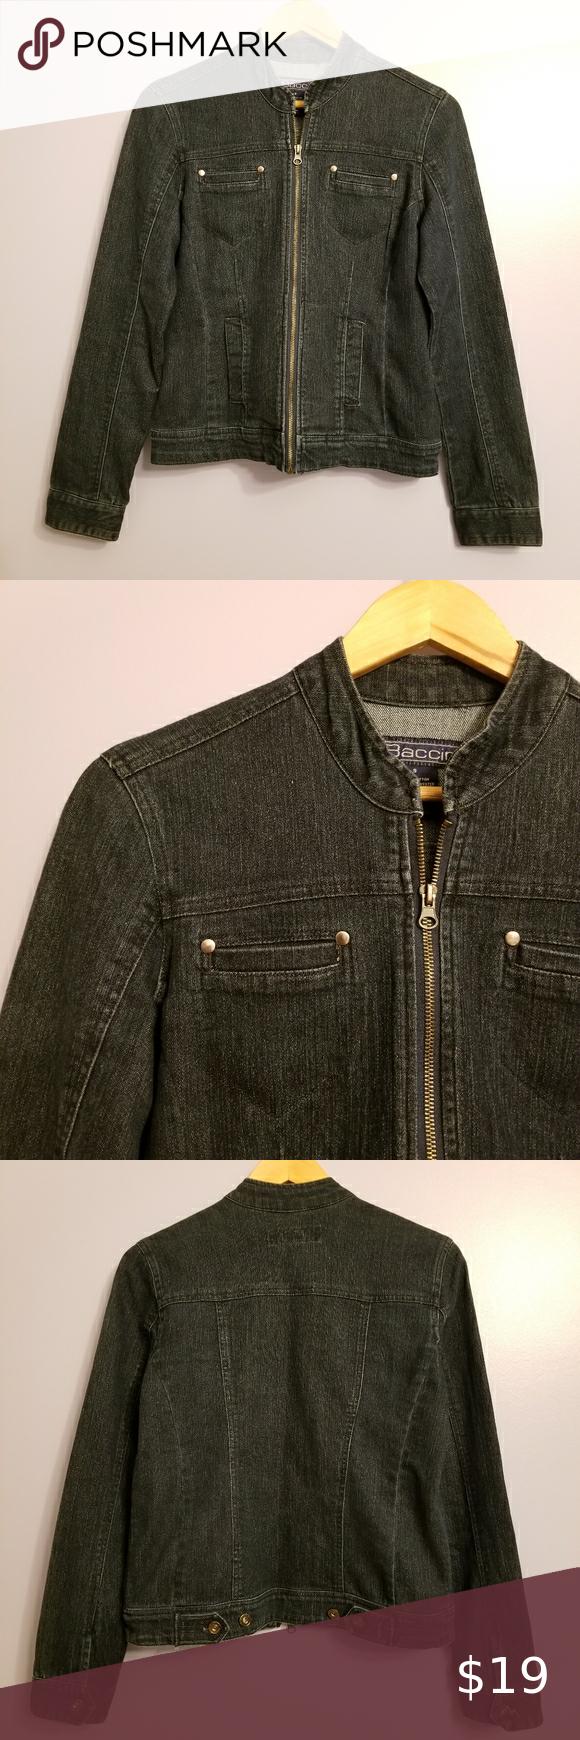 Baccini Zippered Jean Jacket Zipper Jeans Jean Jacket Clothes Design [ 1740 x 580 Pixel ]